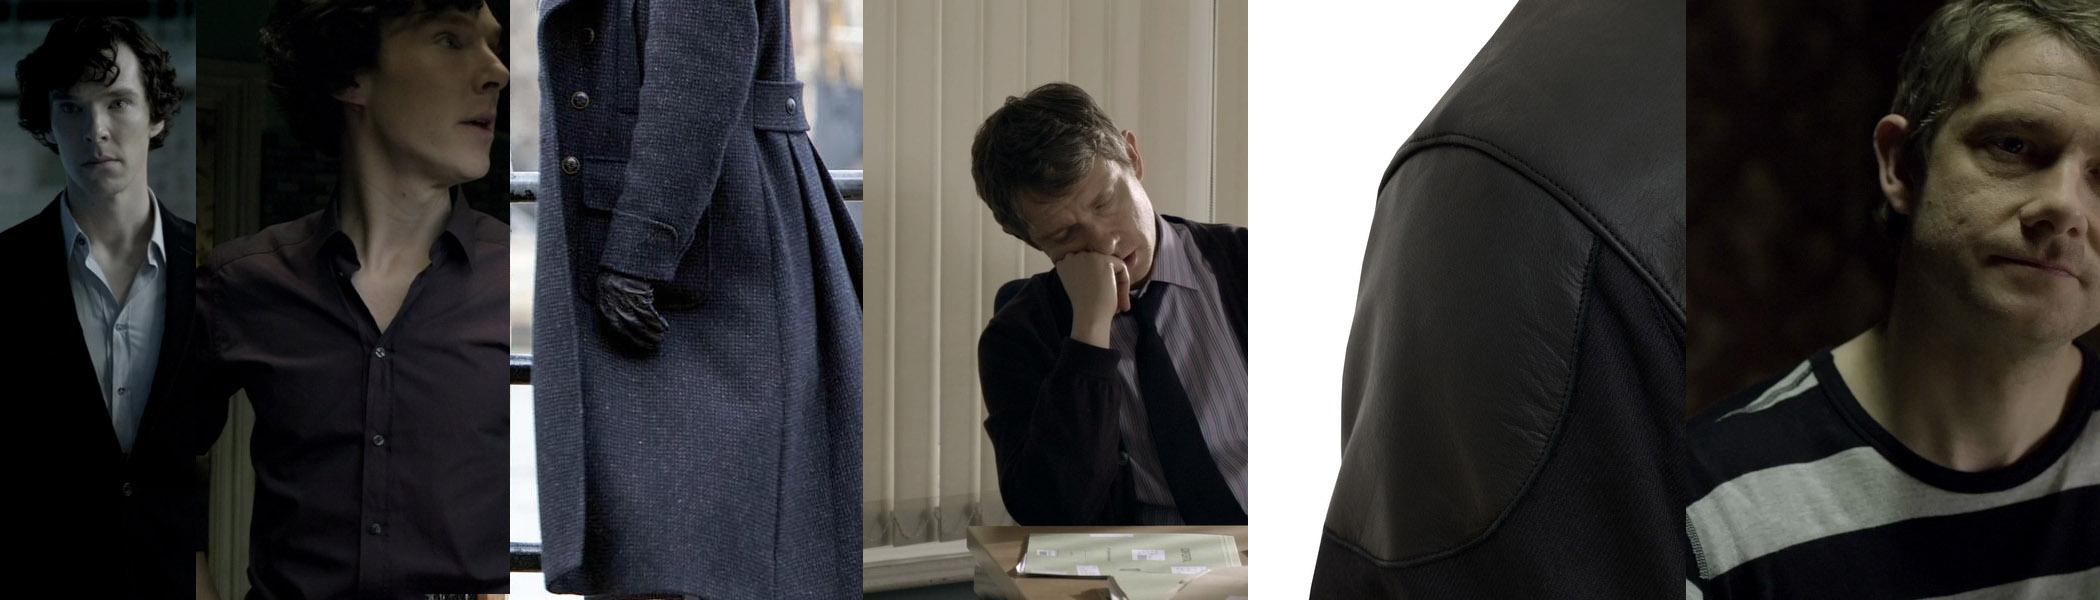 Sherlock Series 2: Irene Adler — FASHIONED FOR THE GEEK